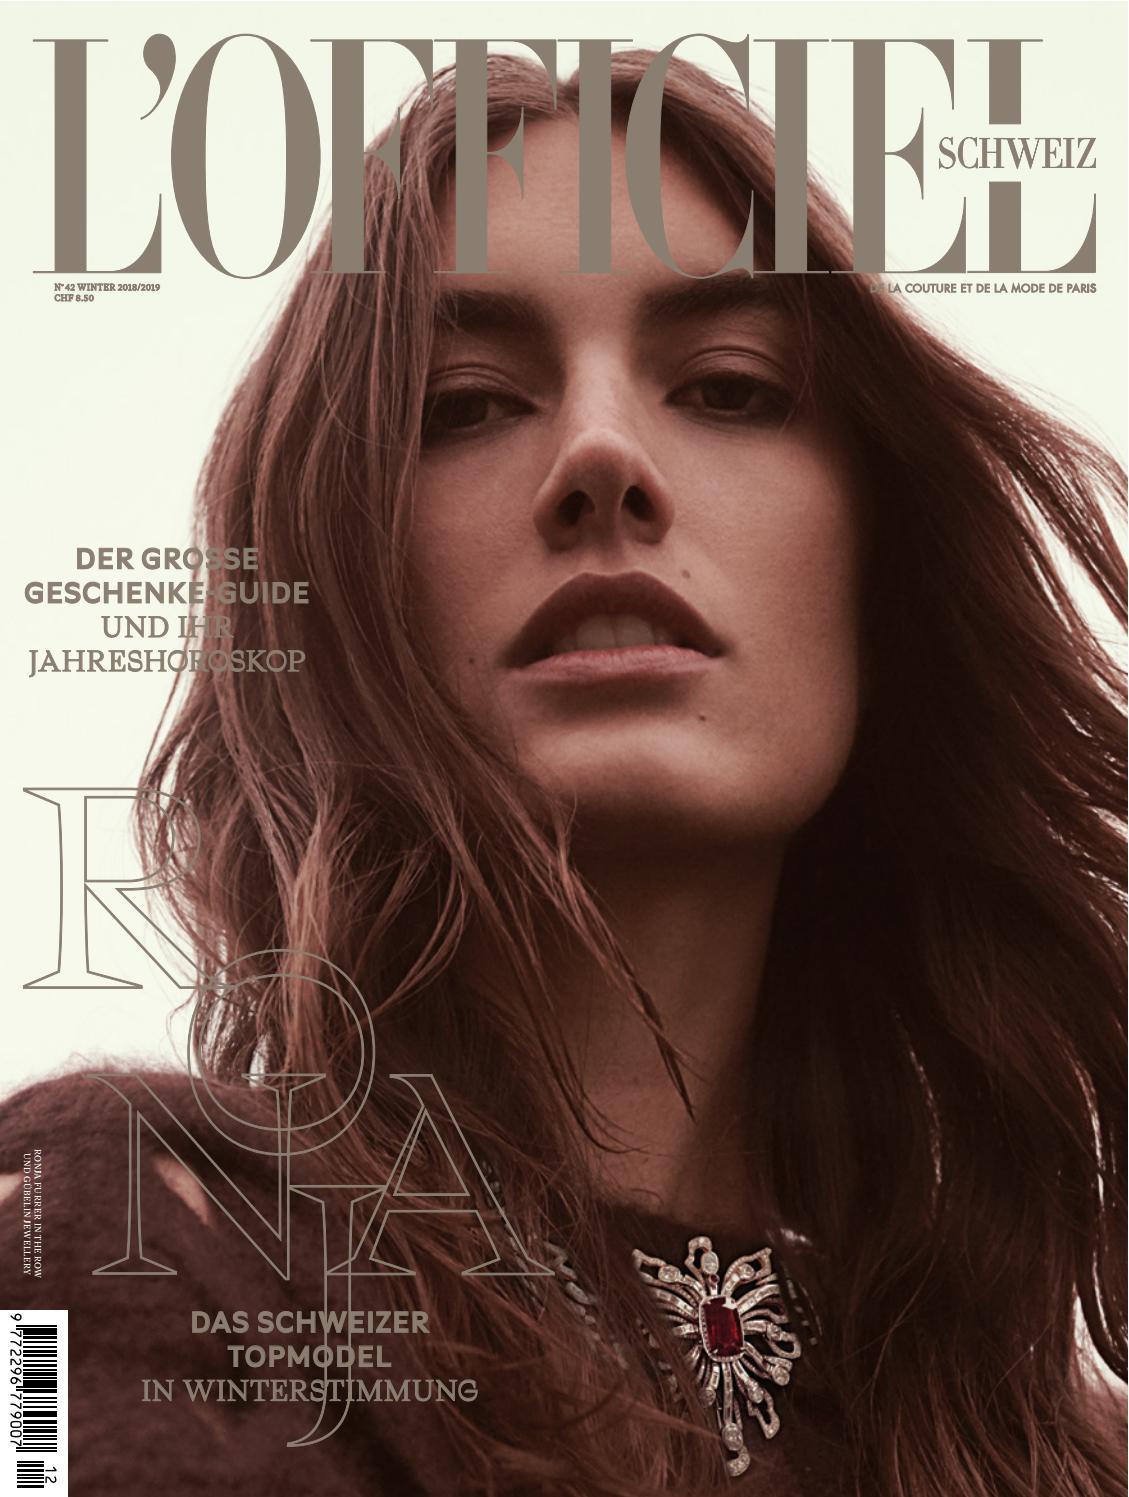 L'OFFICIEL No. 42 Winter 20182019 DE by L'Officiel Schweiz